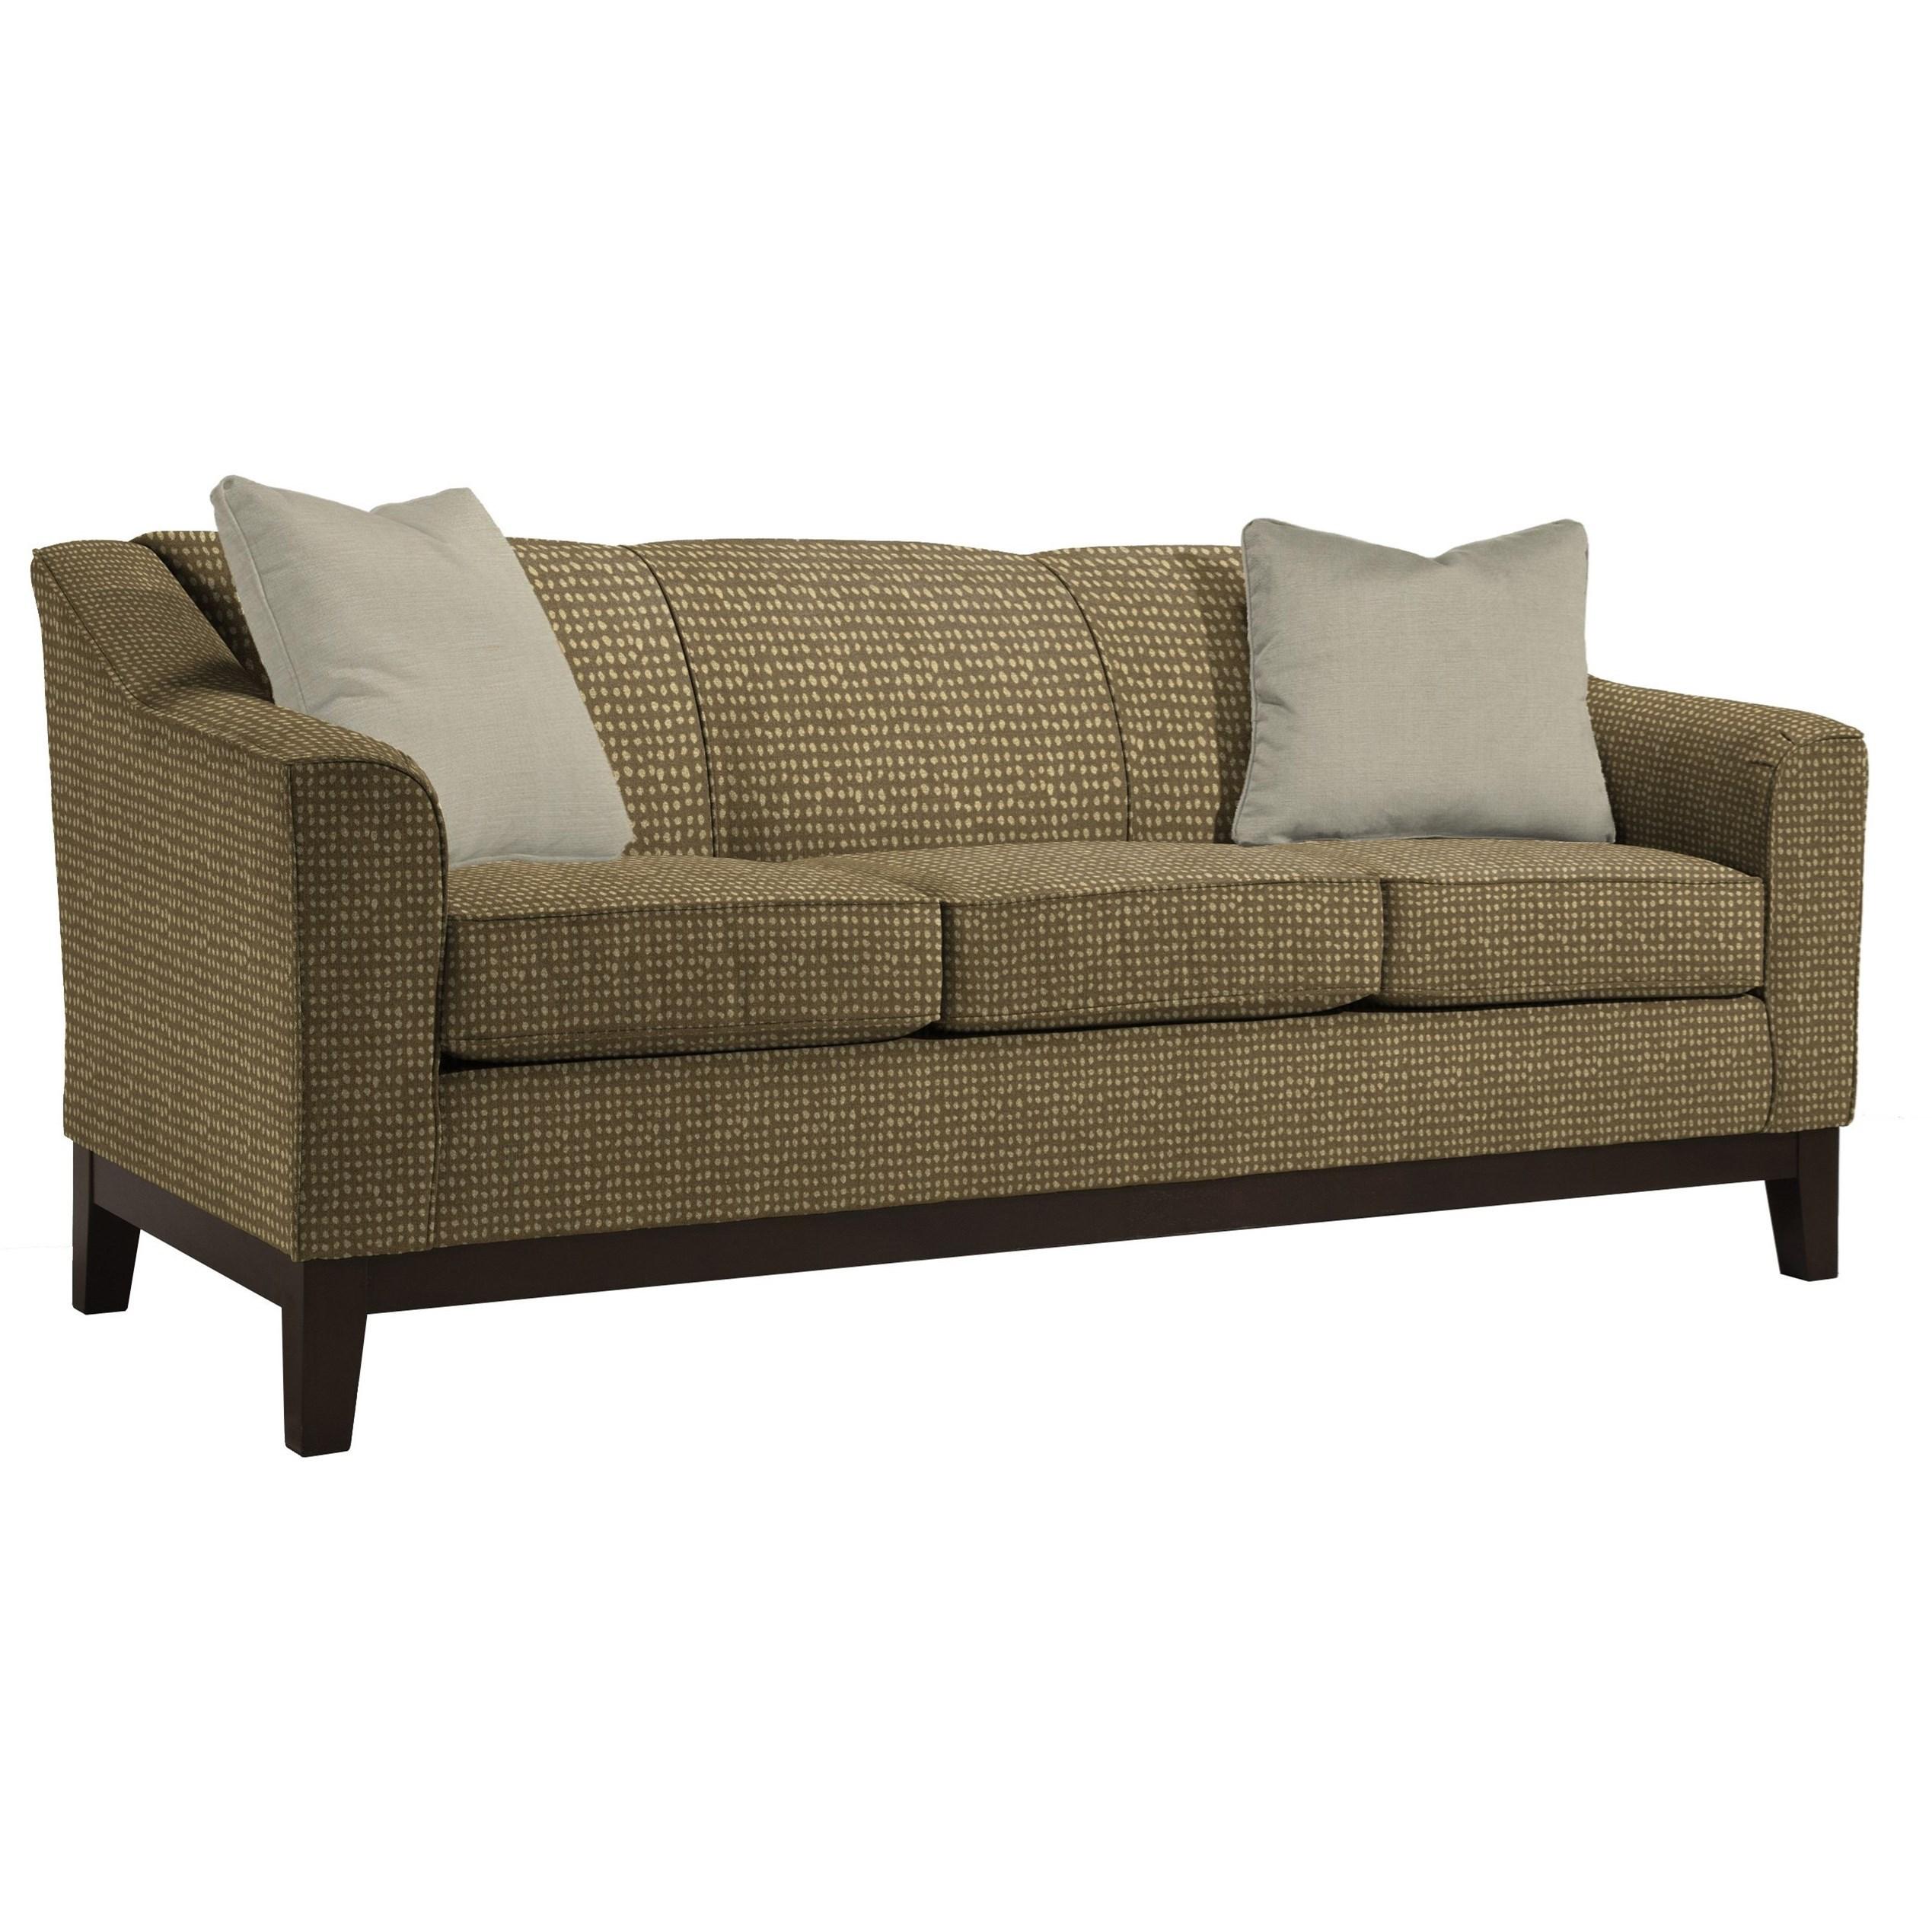 Best Home Furnishings Emeline Customizable Sofa - Item Number: 206338137-34633